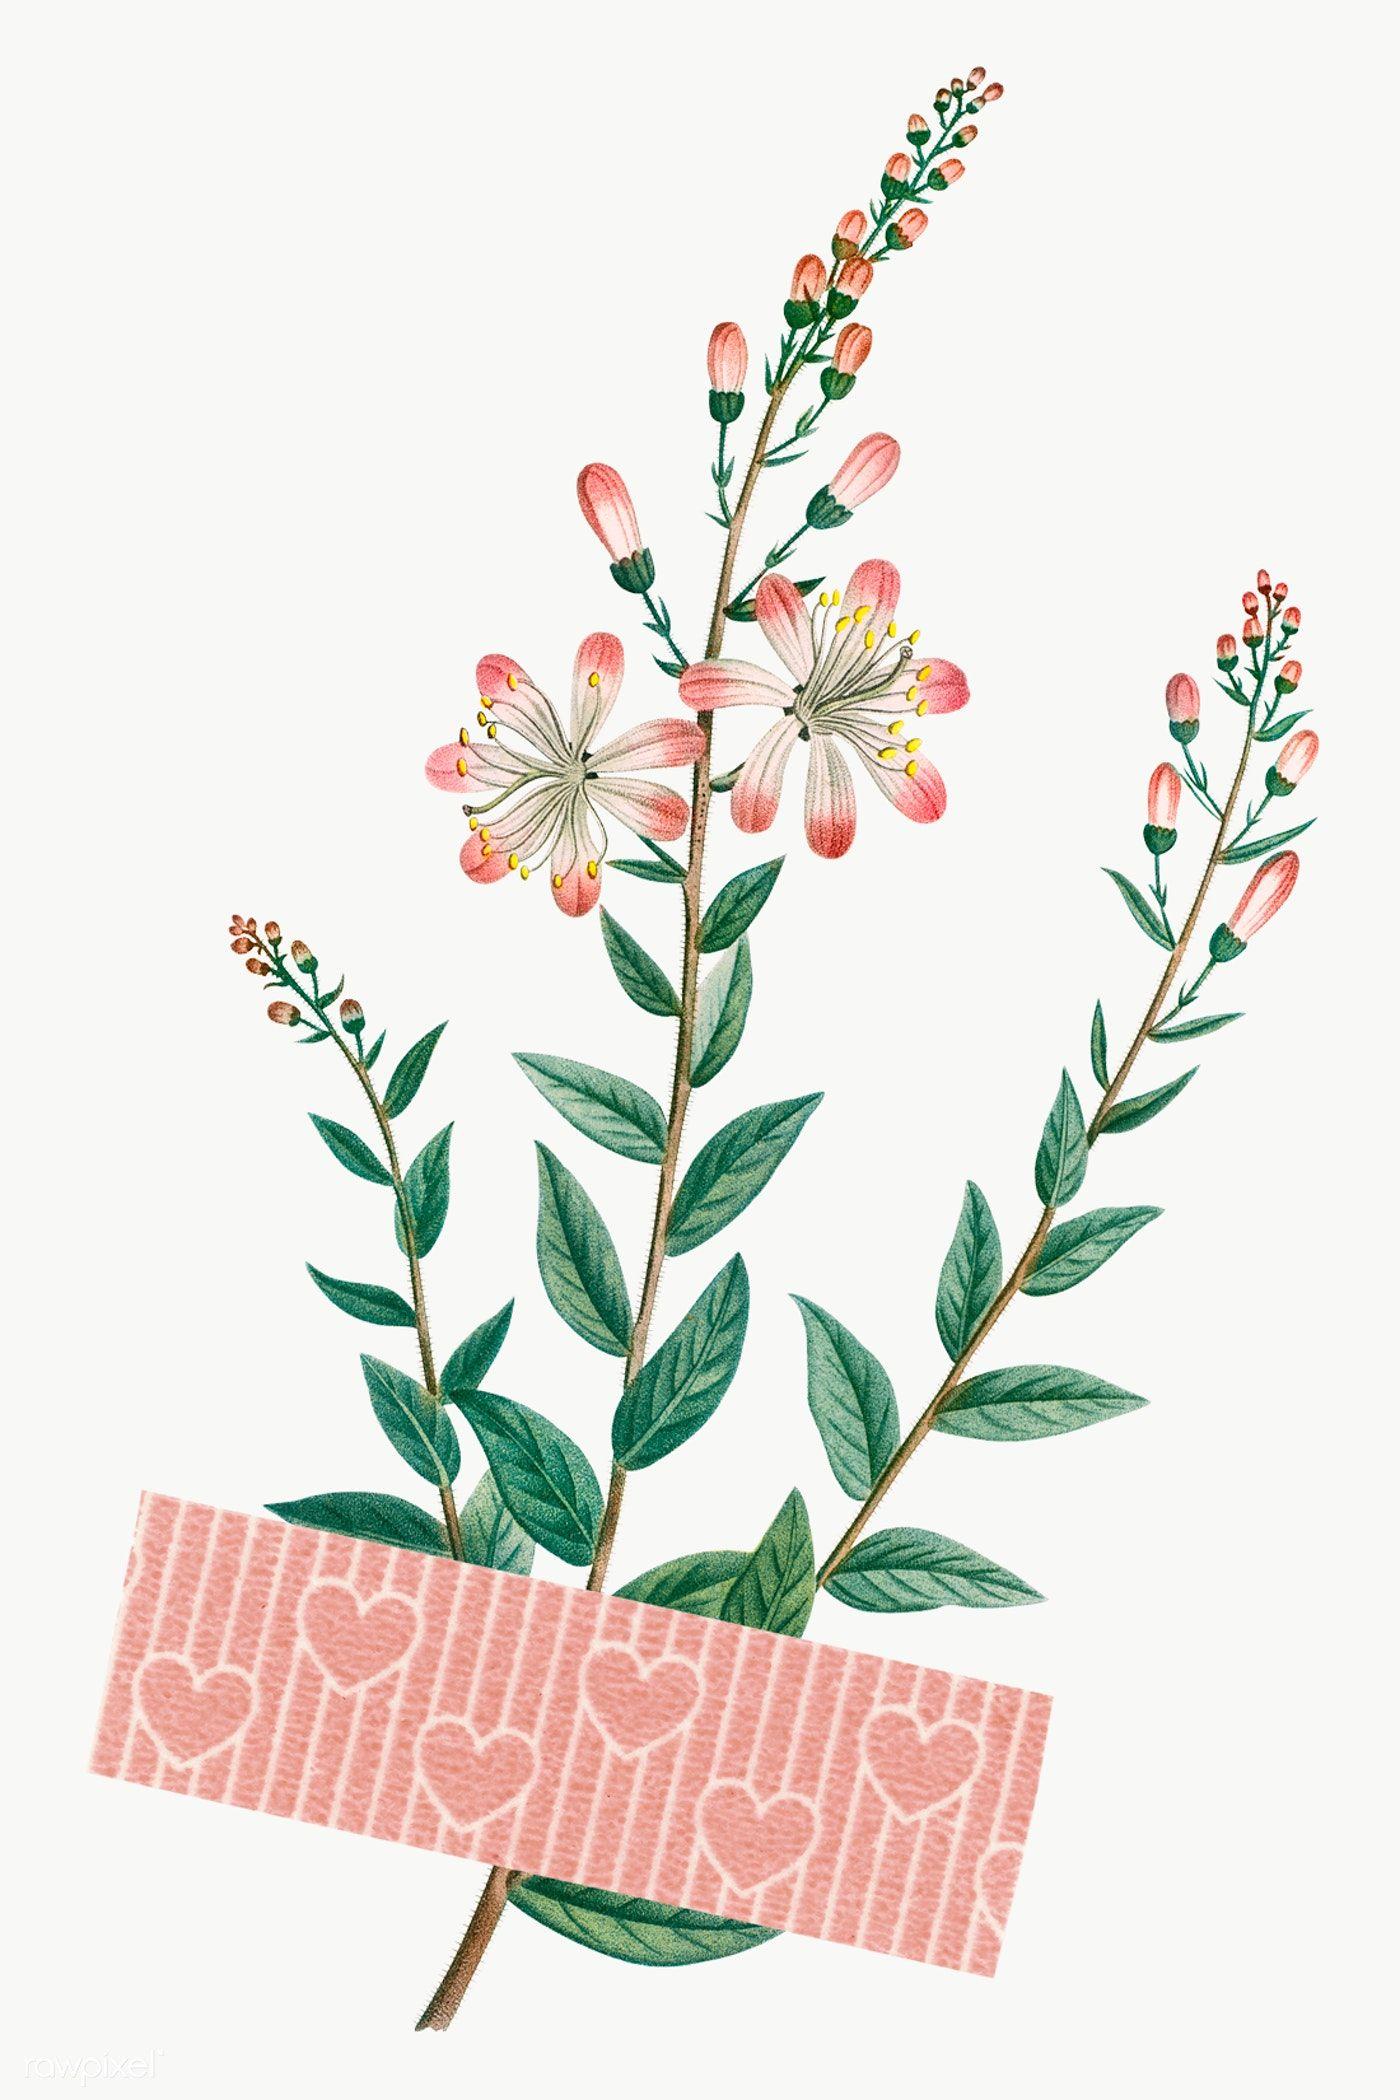 Flower With A Pink Washi Tape Design Element Transparent Png Premium Image By Rawpixel Com Ningzk V Flower Aesthetic Flower Drawing Flower Illustration